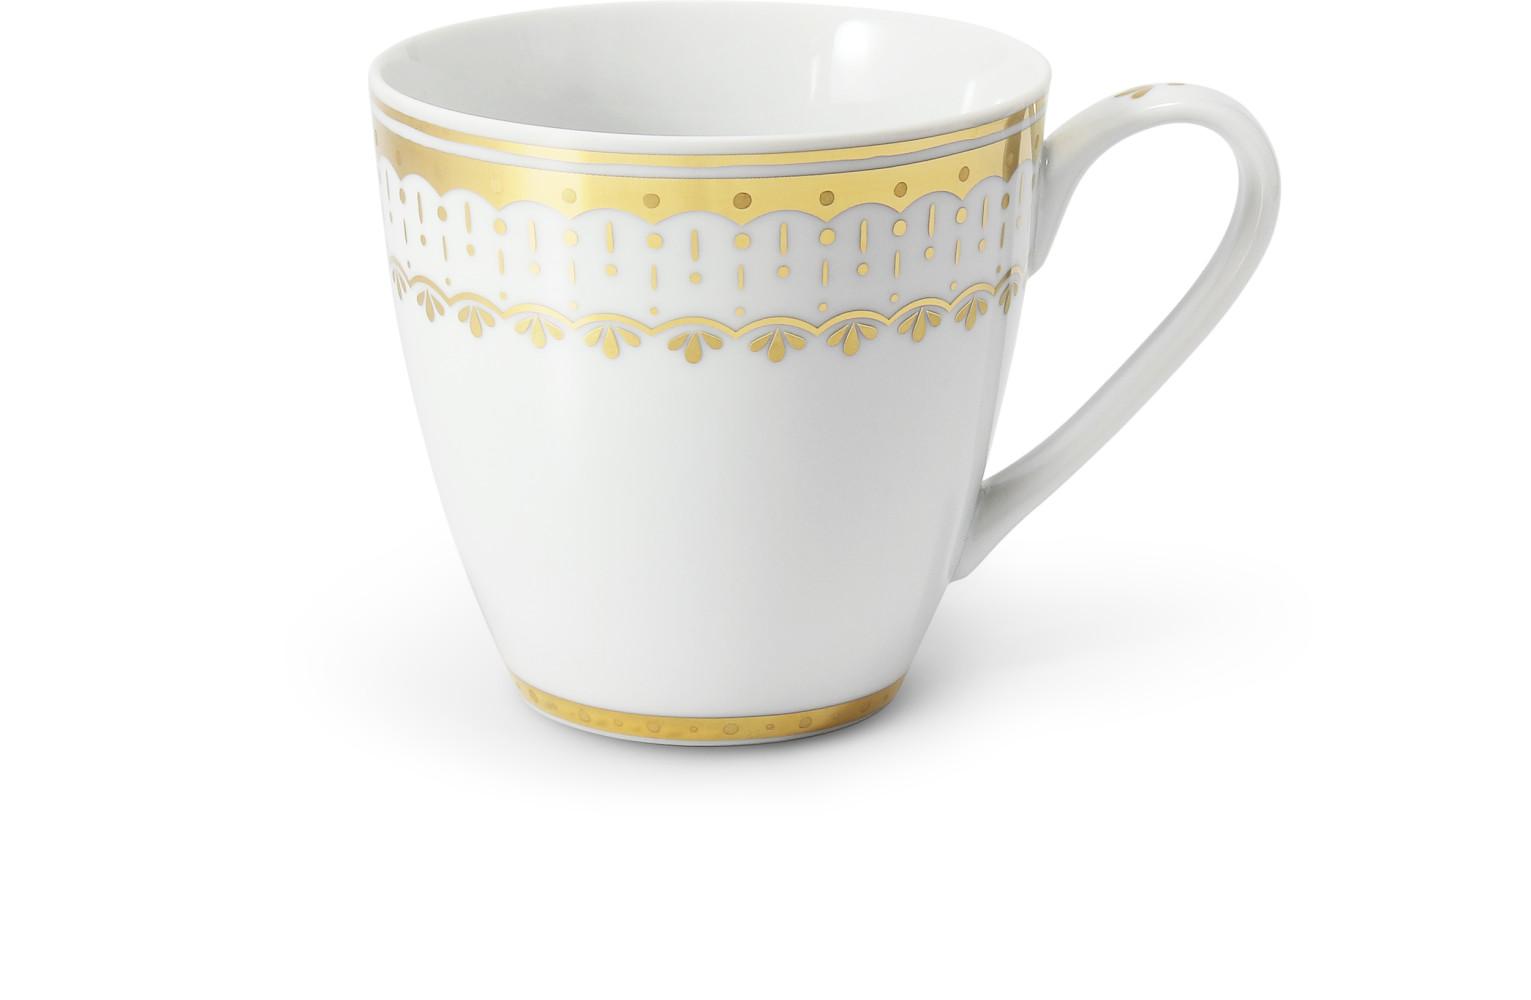 Mug 0.30 l HyggeLine gilded var.3